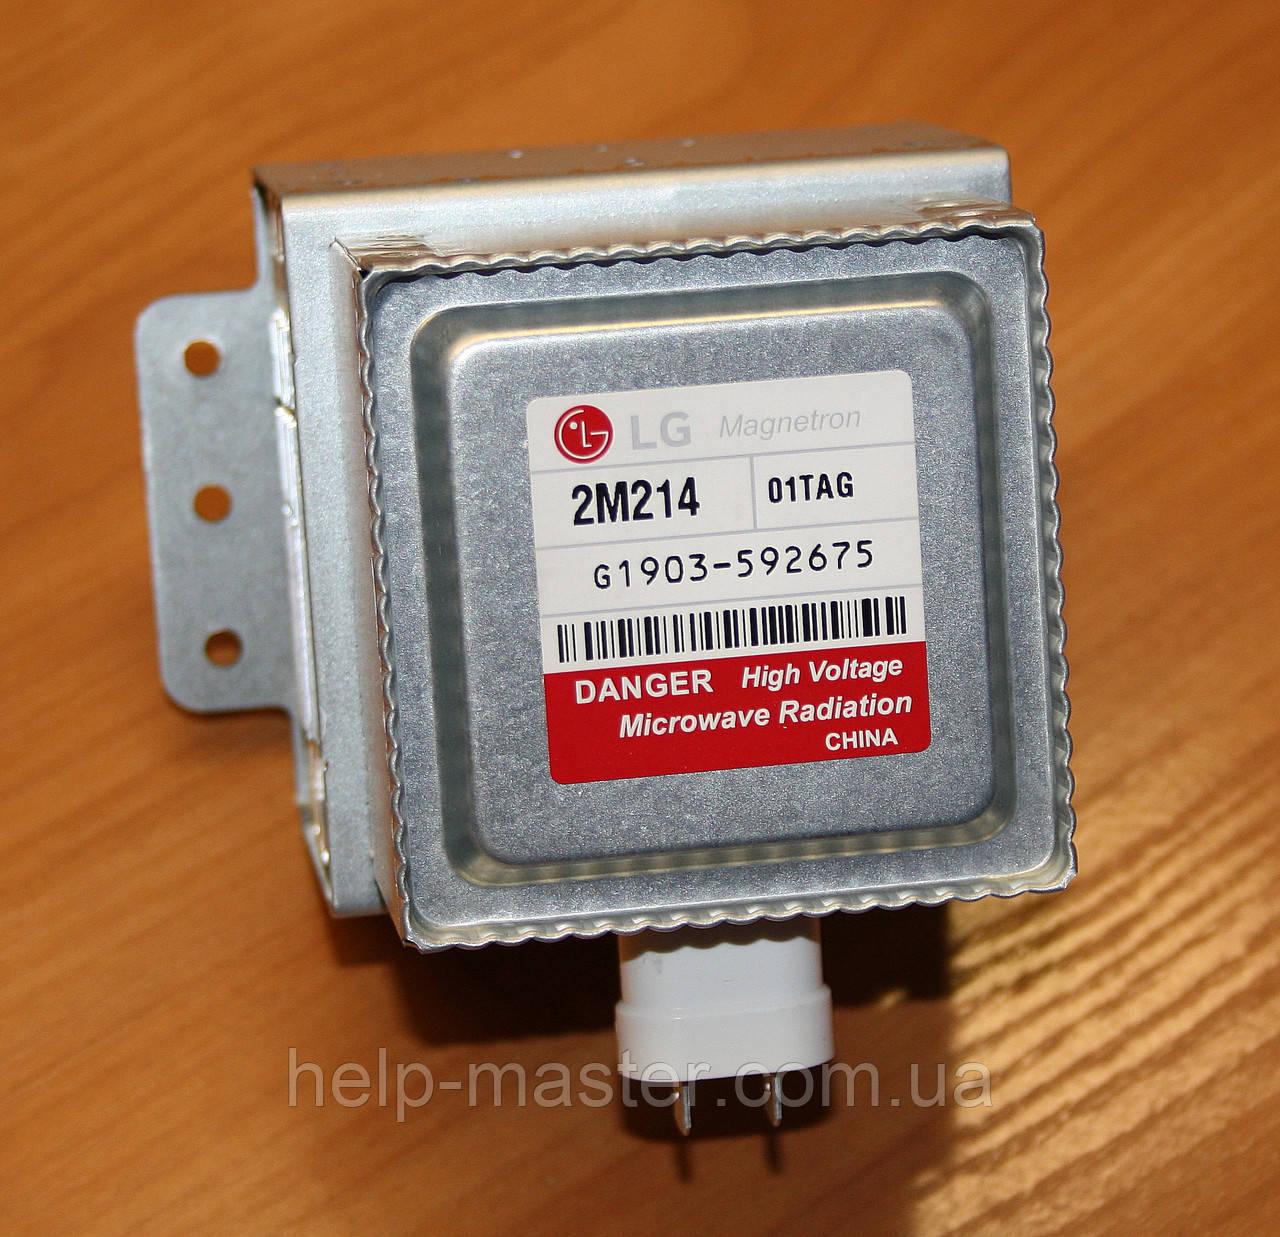 Магнетрон   LG 2M214 (01TAG)